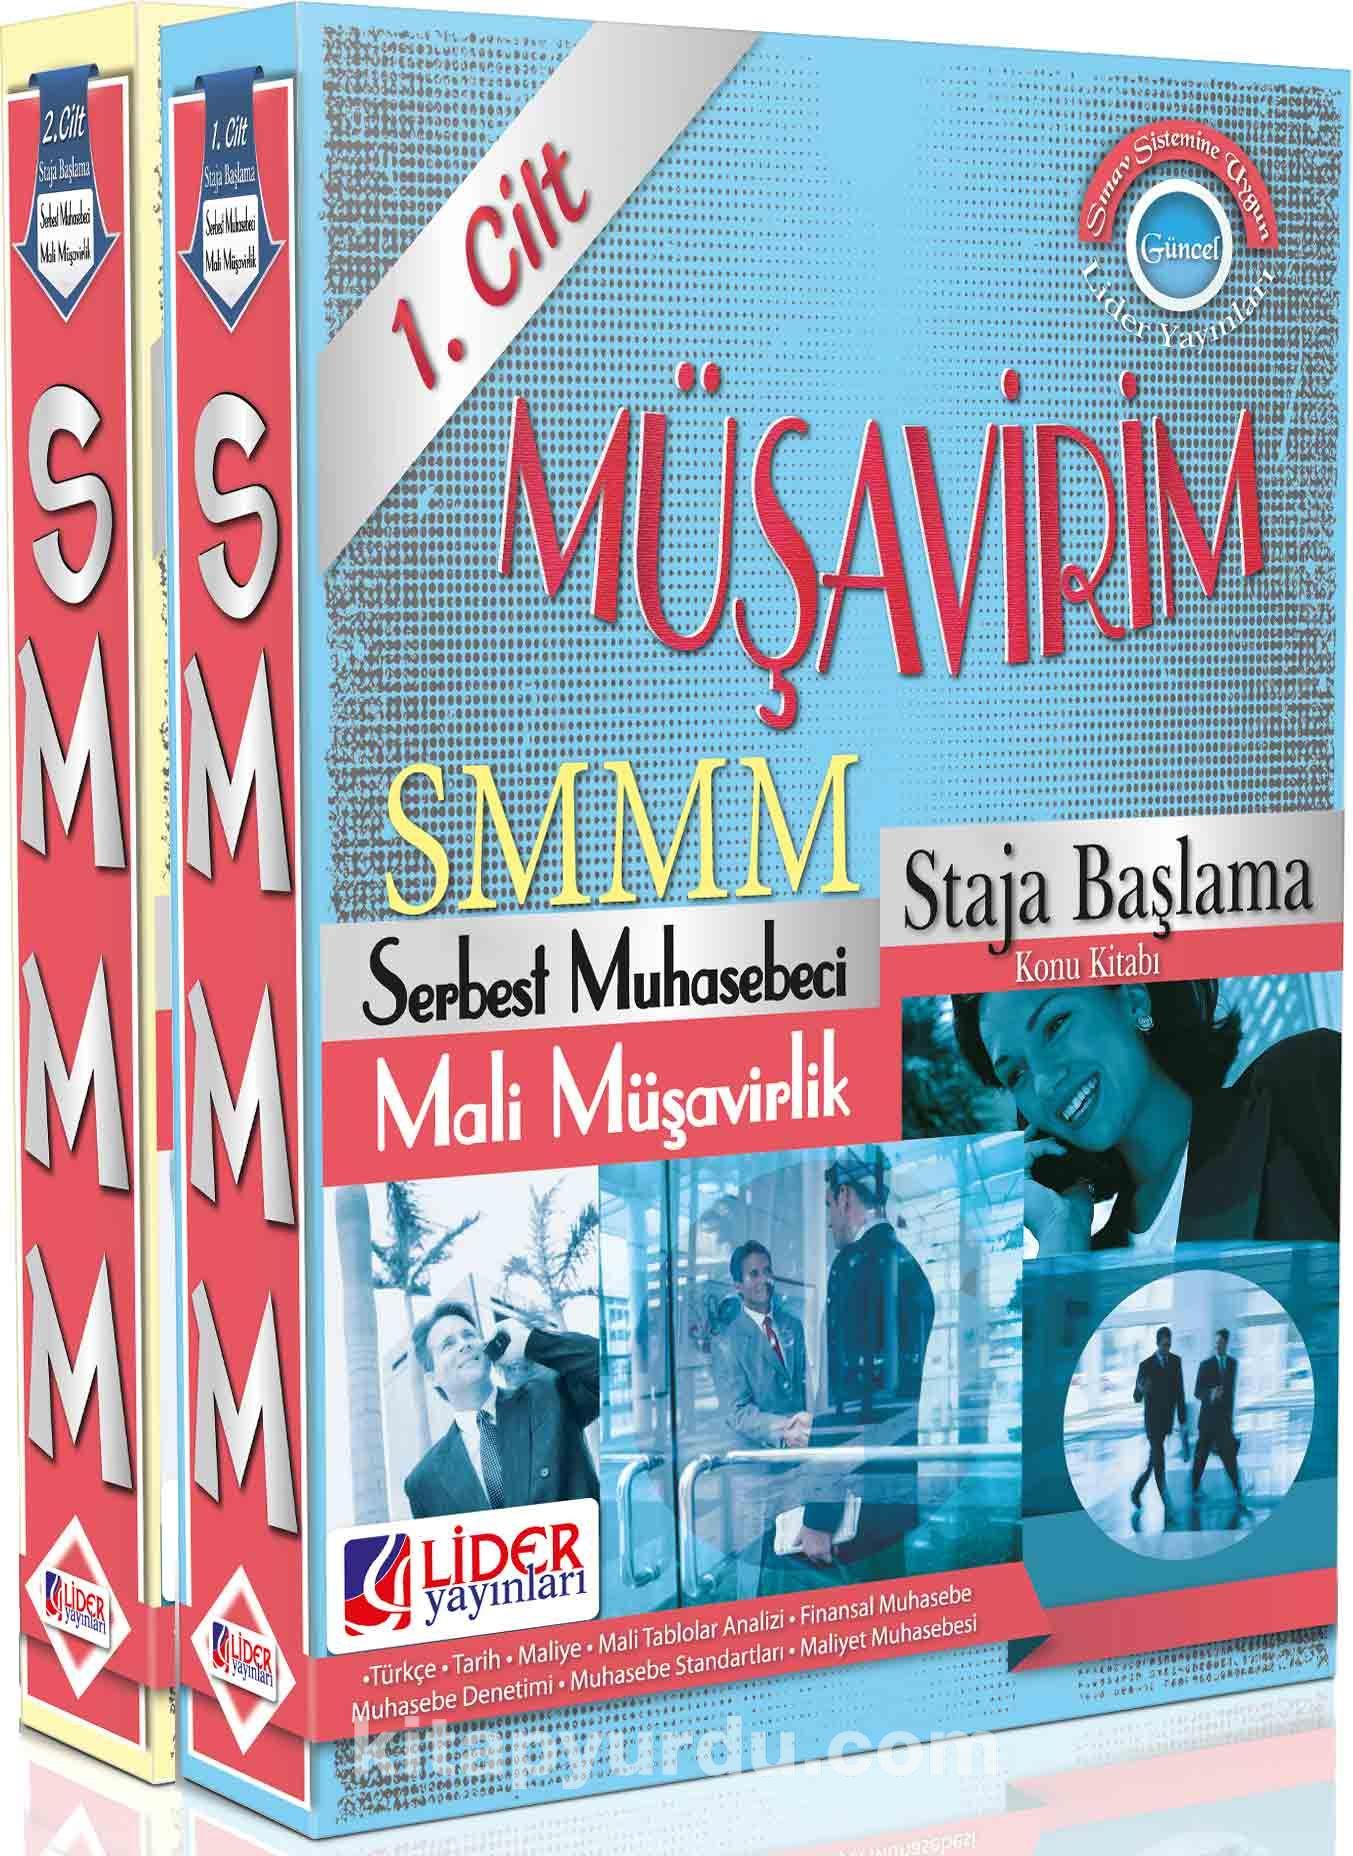 SMMM Staja Başlama Konu Kitabı (2 Kitap Takım) - Kollektif pdf epub